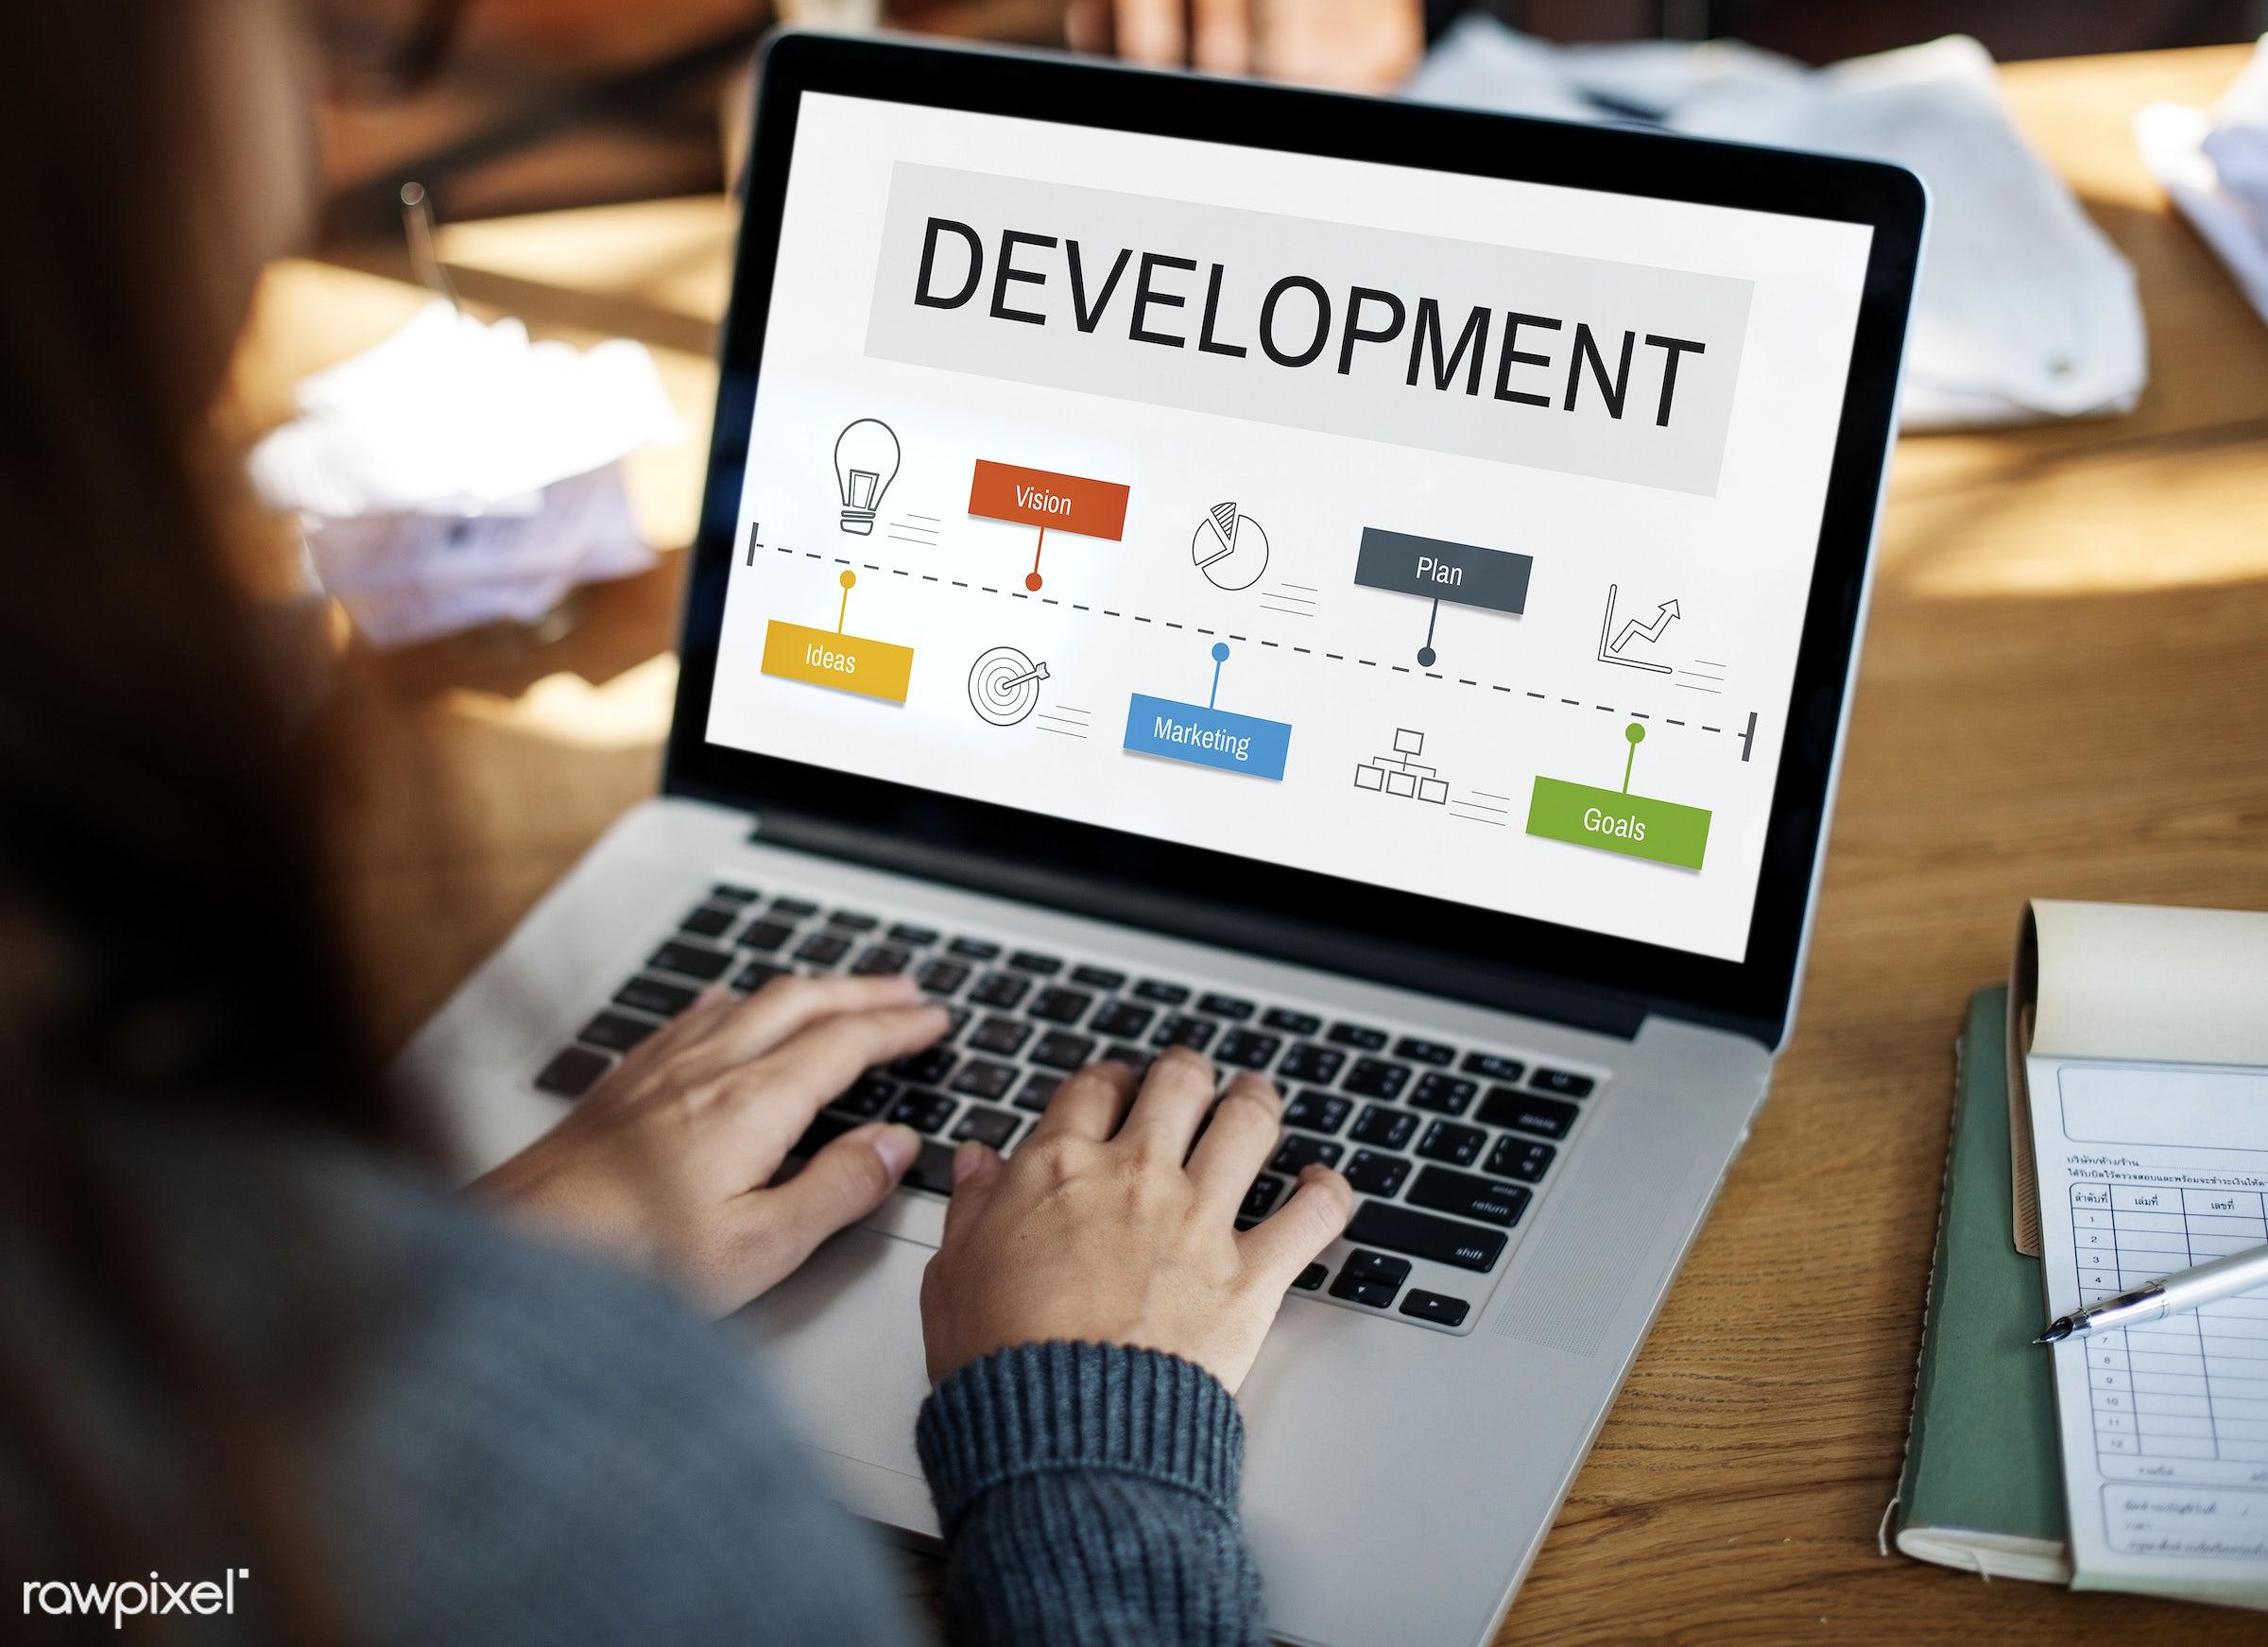 arrow, browsing, business, chart, concept, dartboard, design, development, device, digital, digital device, goals, graph,...